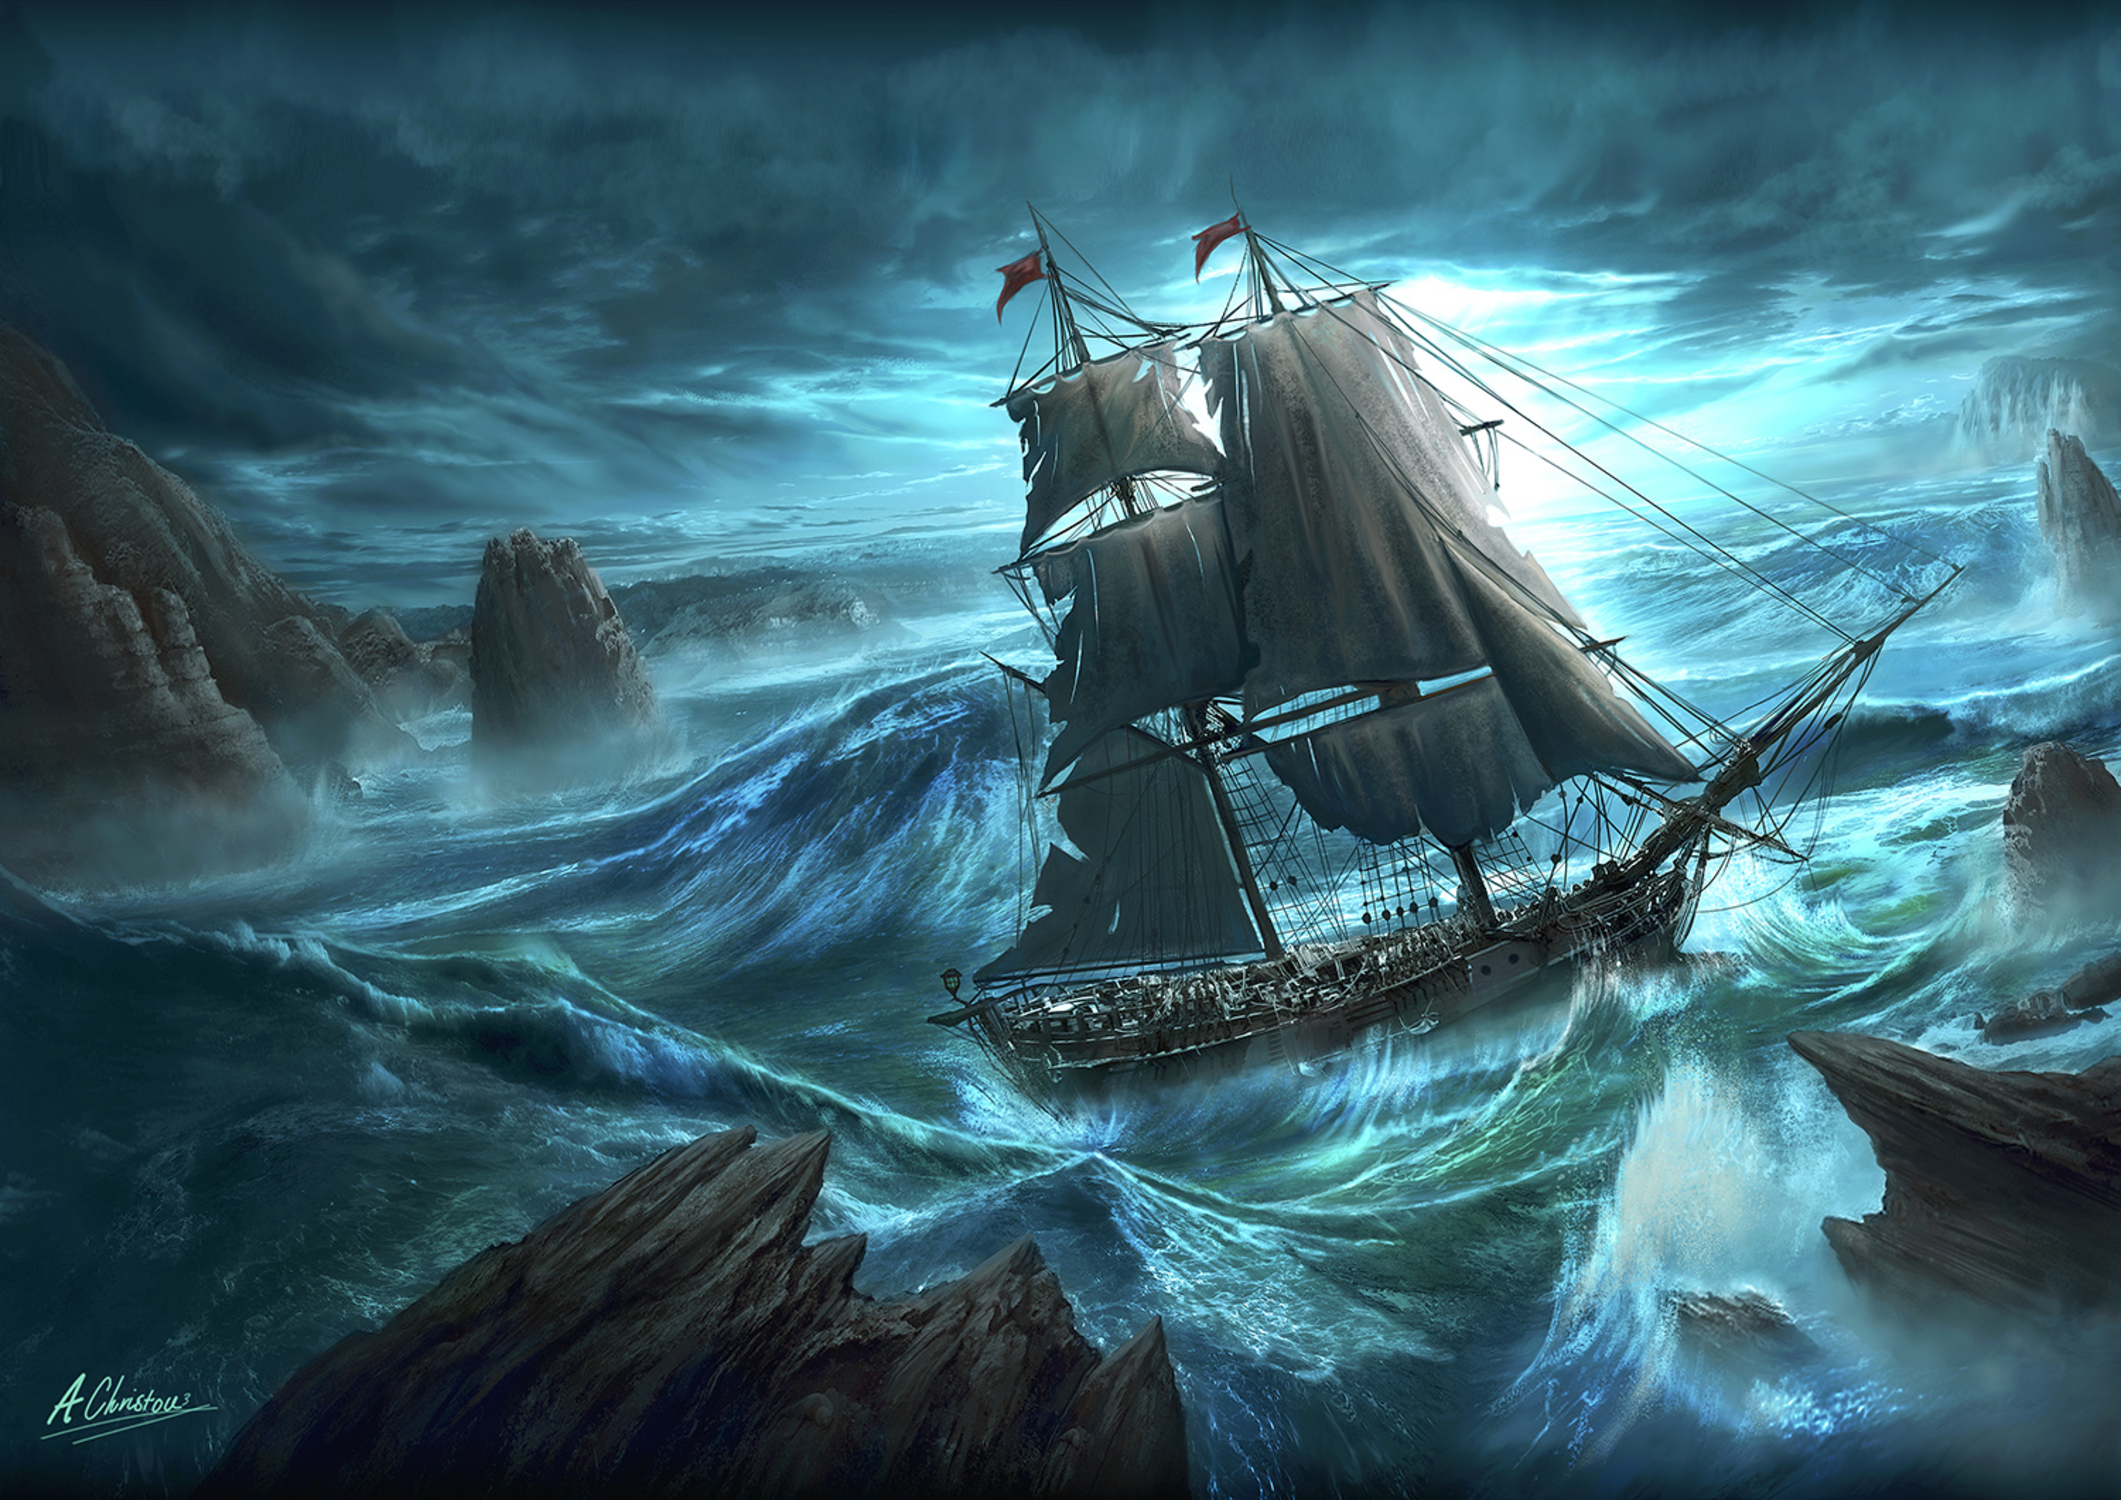 Dangerous Seas Artwork by Anthony Christou